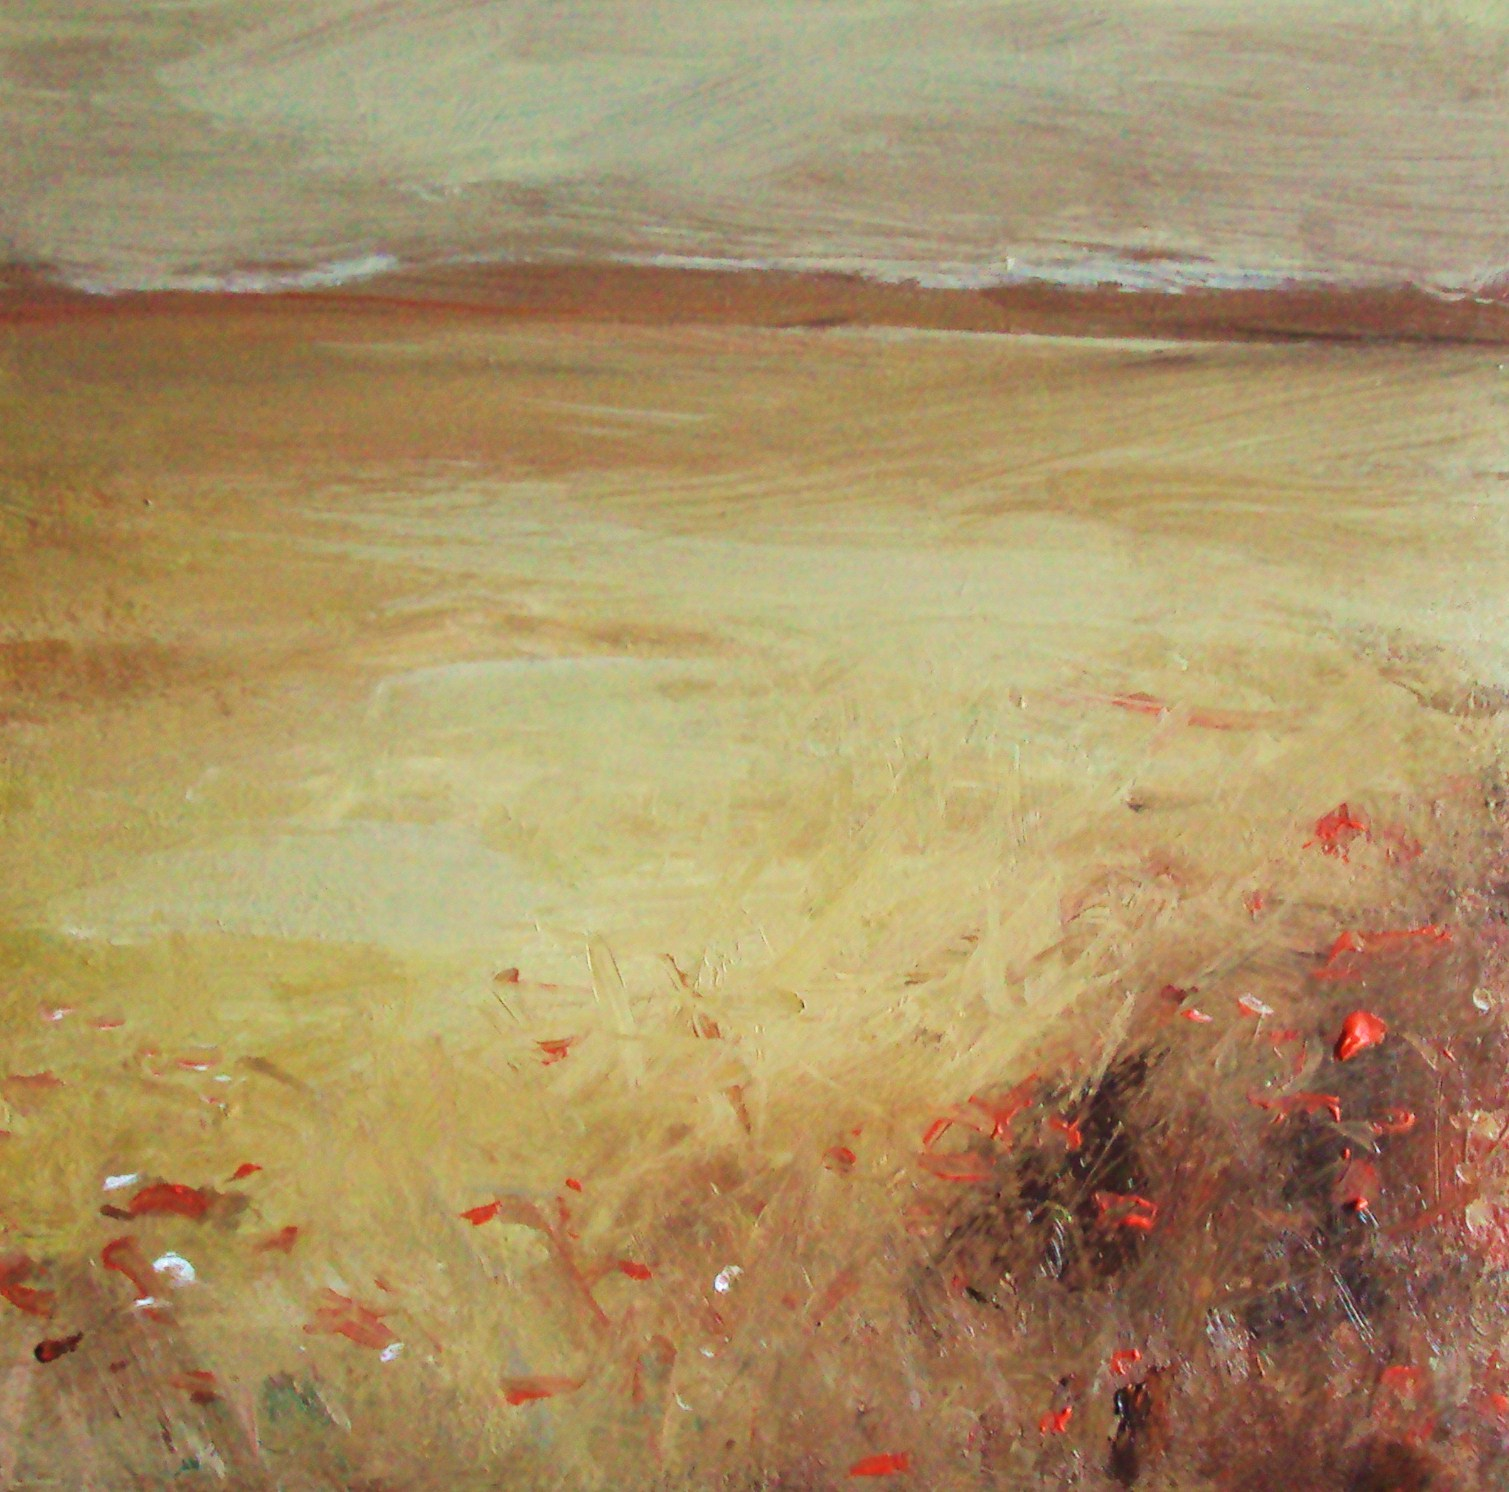 """Corn fields #2"" original fine art by Parastoo Ganjei"